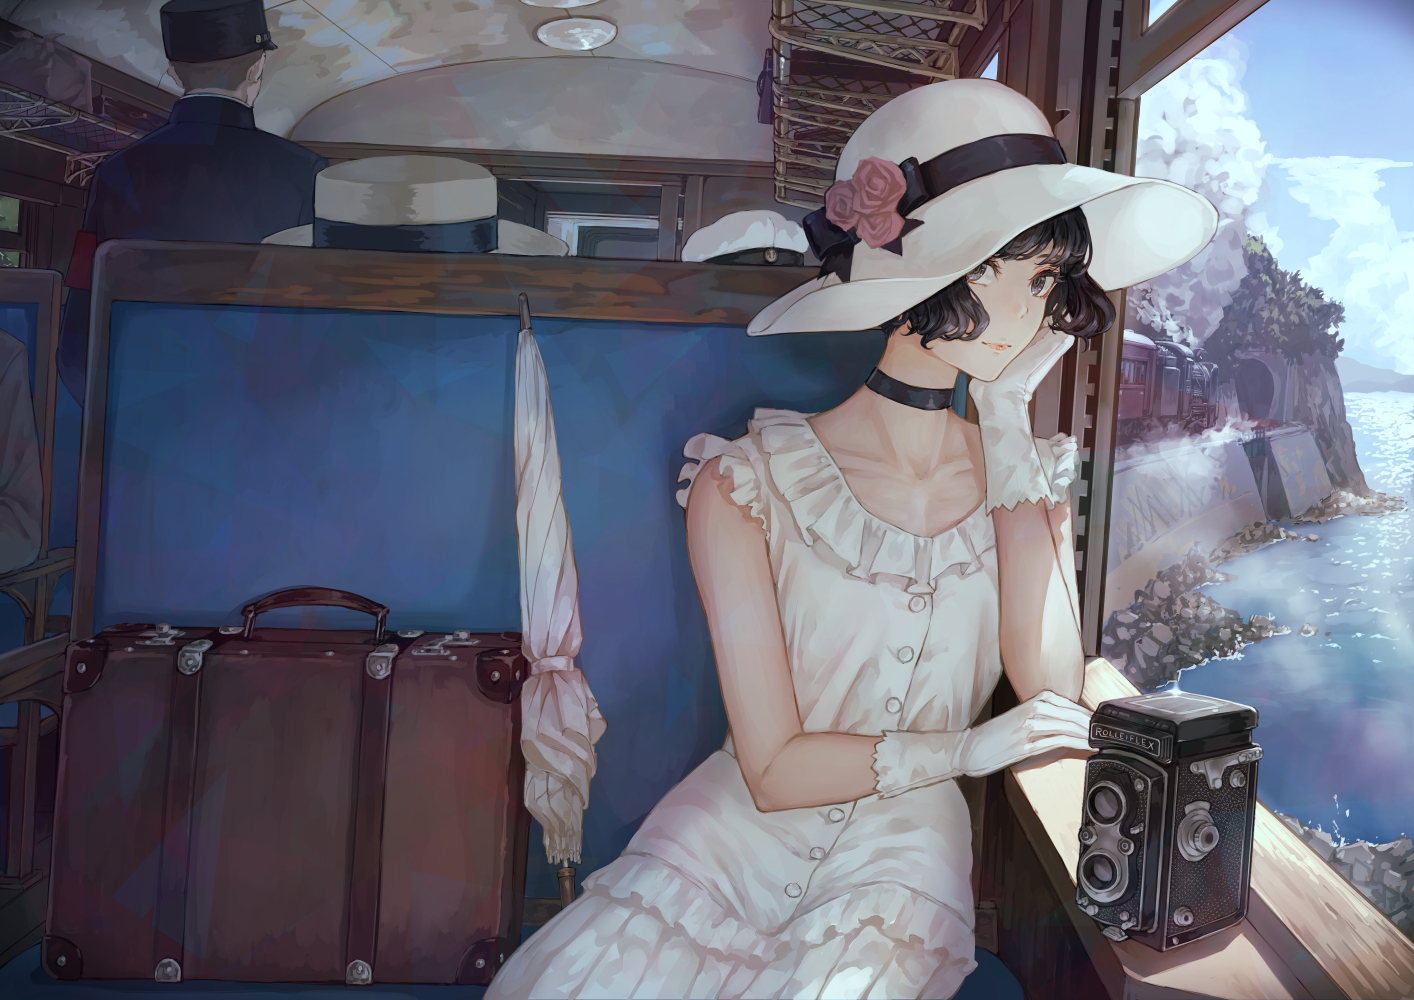 black_eyes black_hair camera choker clouds dress gloves hat lolita_fashion original short_hair sky train umbrella water yasukura_(shibu11)